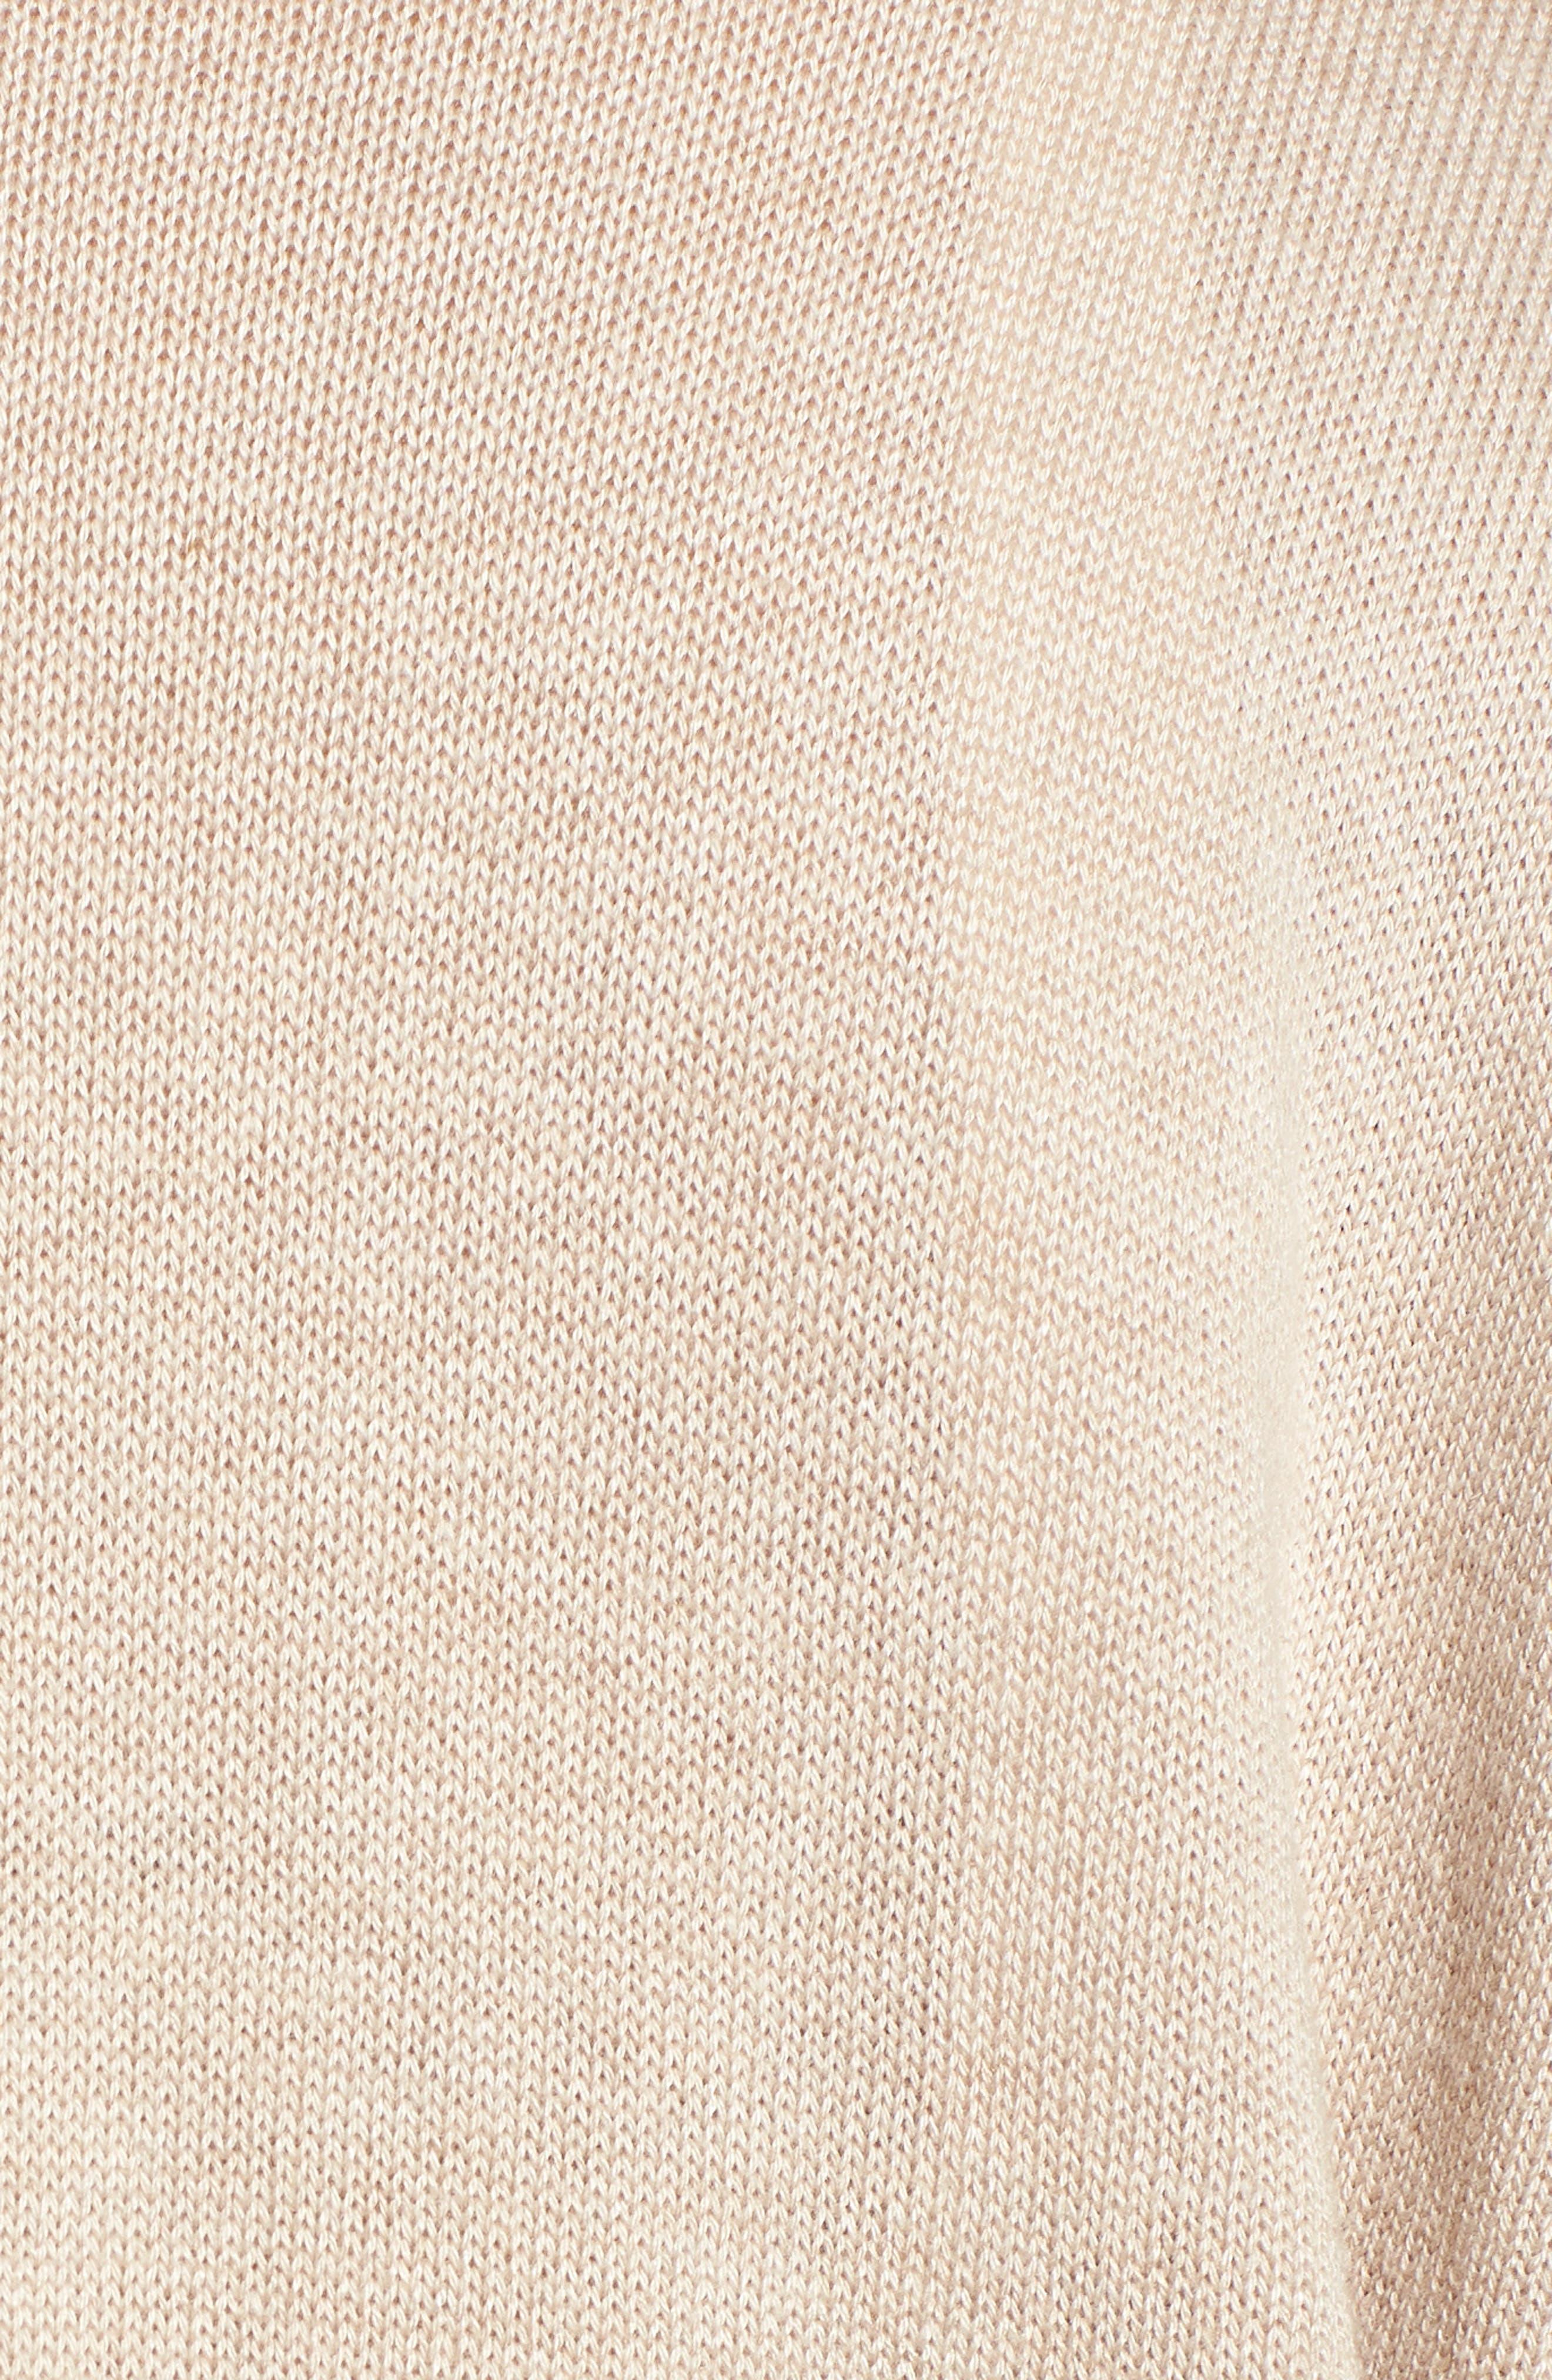 Dolman Sleeve Cardigan,                             Alternate thumbnail 5, color,                             Tan Etherea Heather